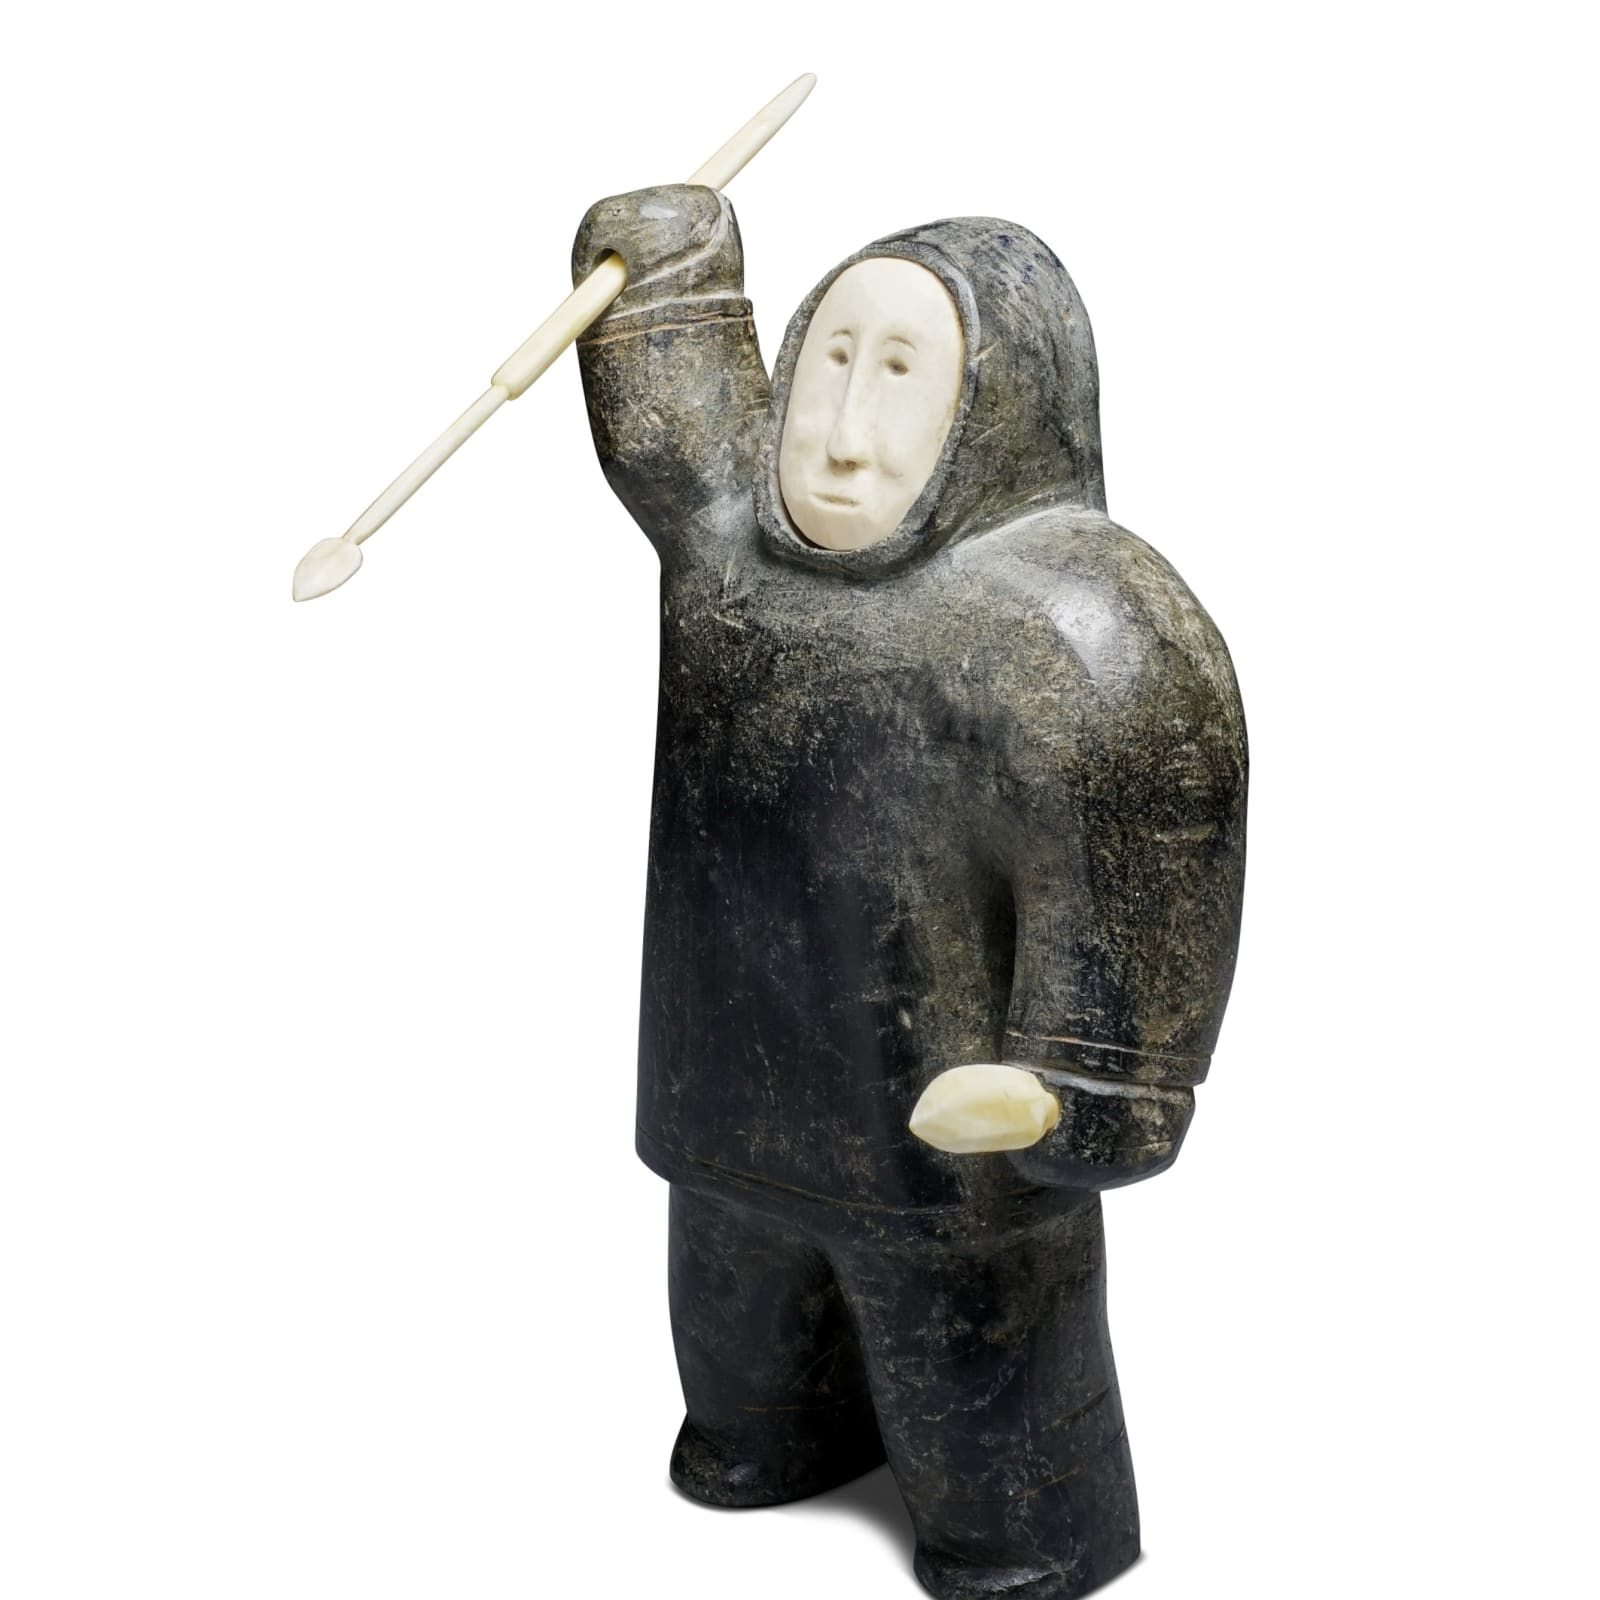 LOT 22  UNIDENTIFIED ARTIST, INUKJUAK (PORT HARRISON) or PUVIRNITUQ (POVUNGNITUK) Standing Hunter Hurling Harpoon, c. 1950-3 stone, ivory, and graphite, 7 3/4 x 4 1/4 x 2 1/4 in (19.7 x 10.8 x 5.7 cm)  unsigned.  ESTIMATE: $800 — $1,200